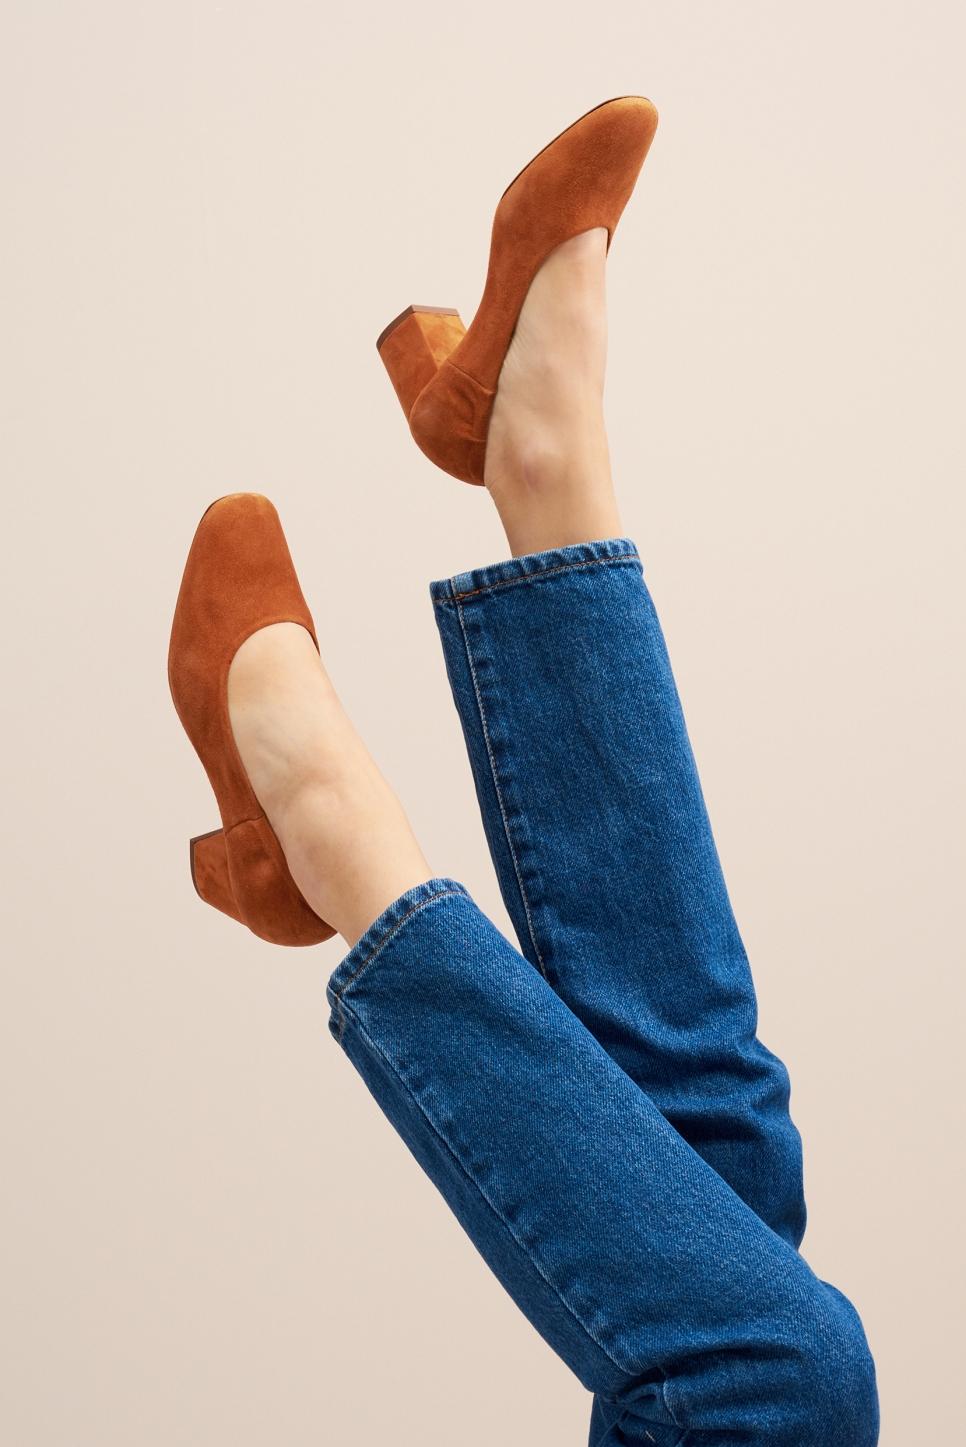 ADELLA heels